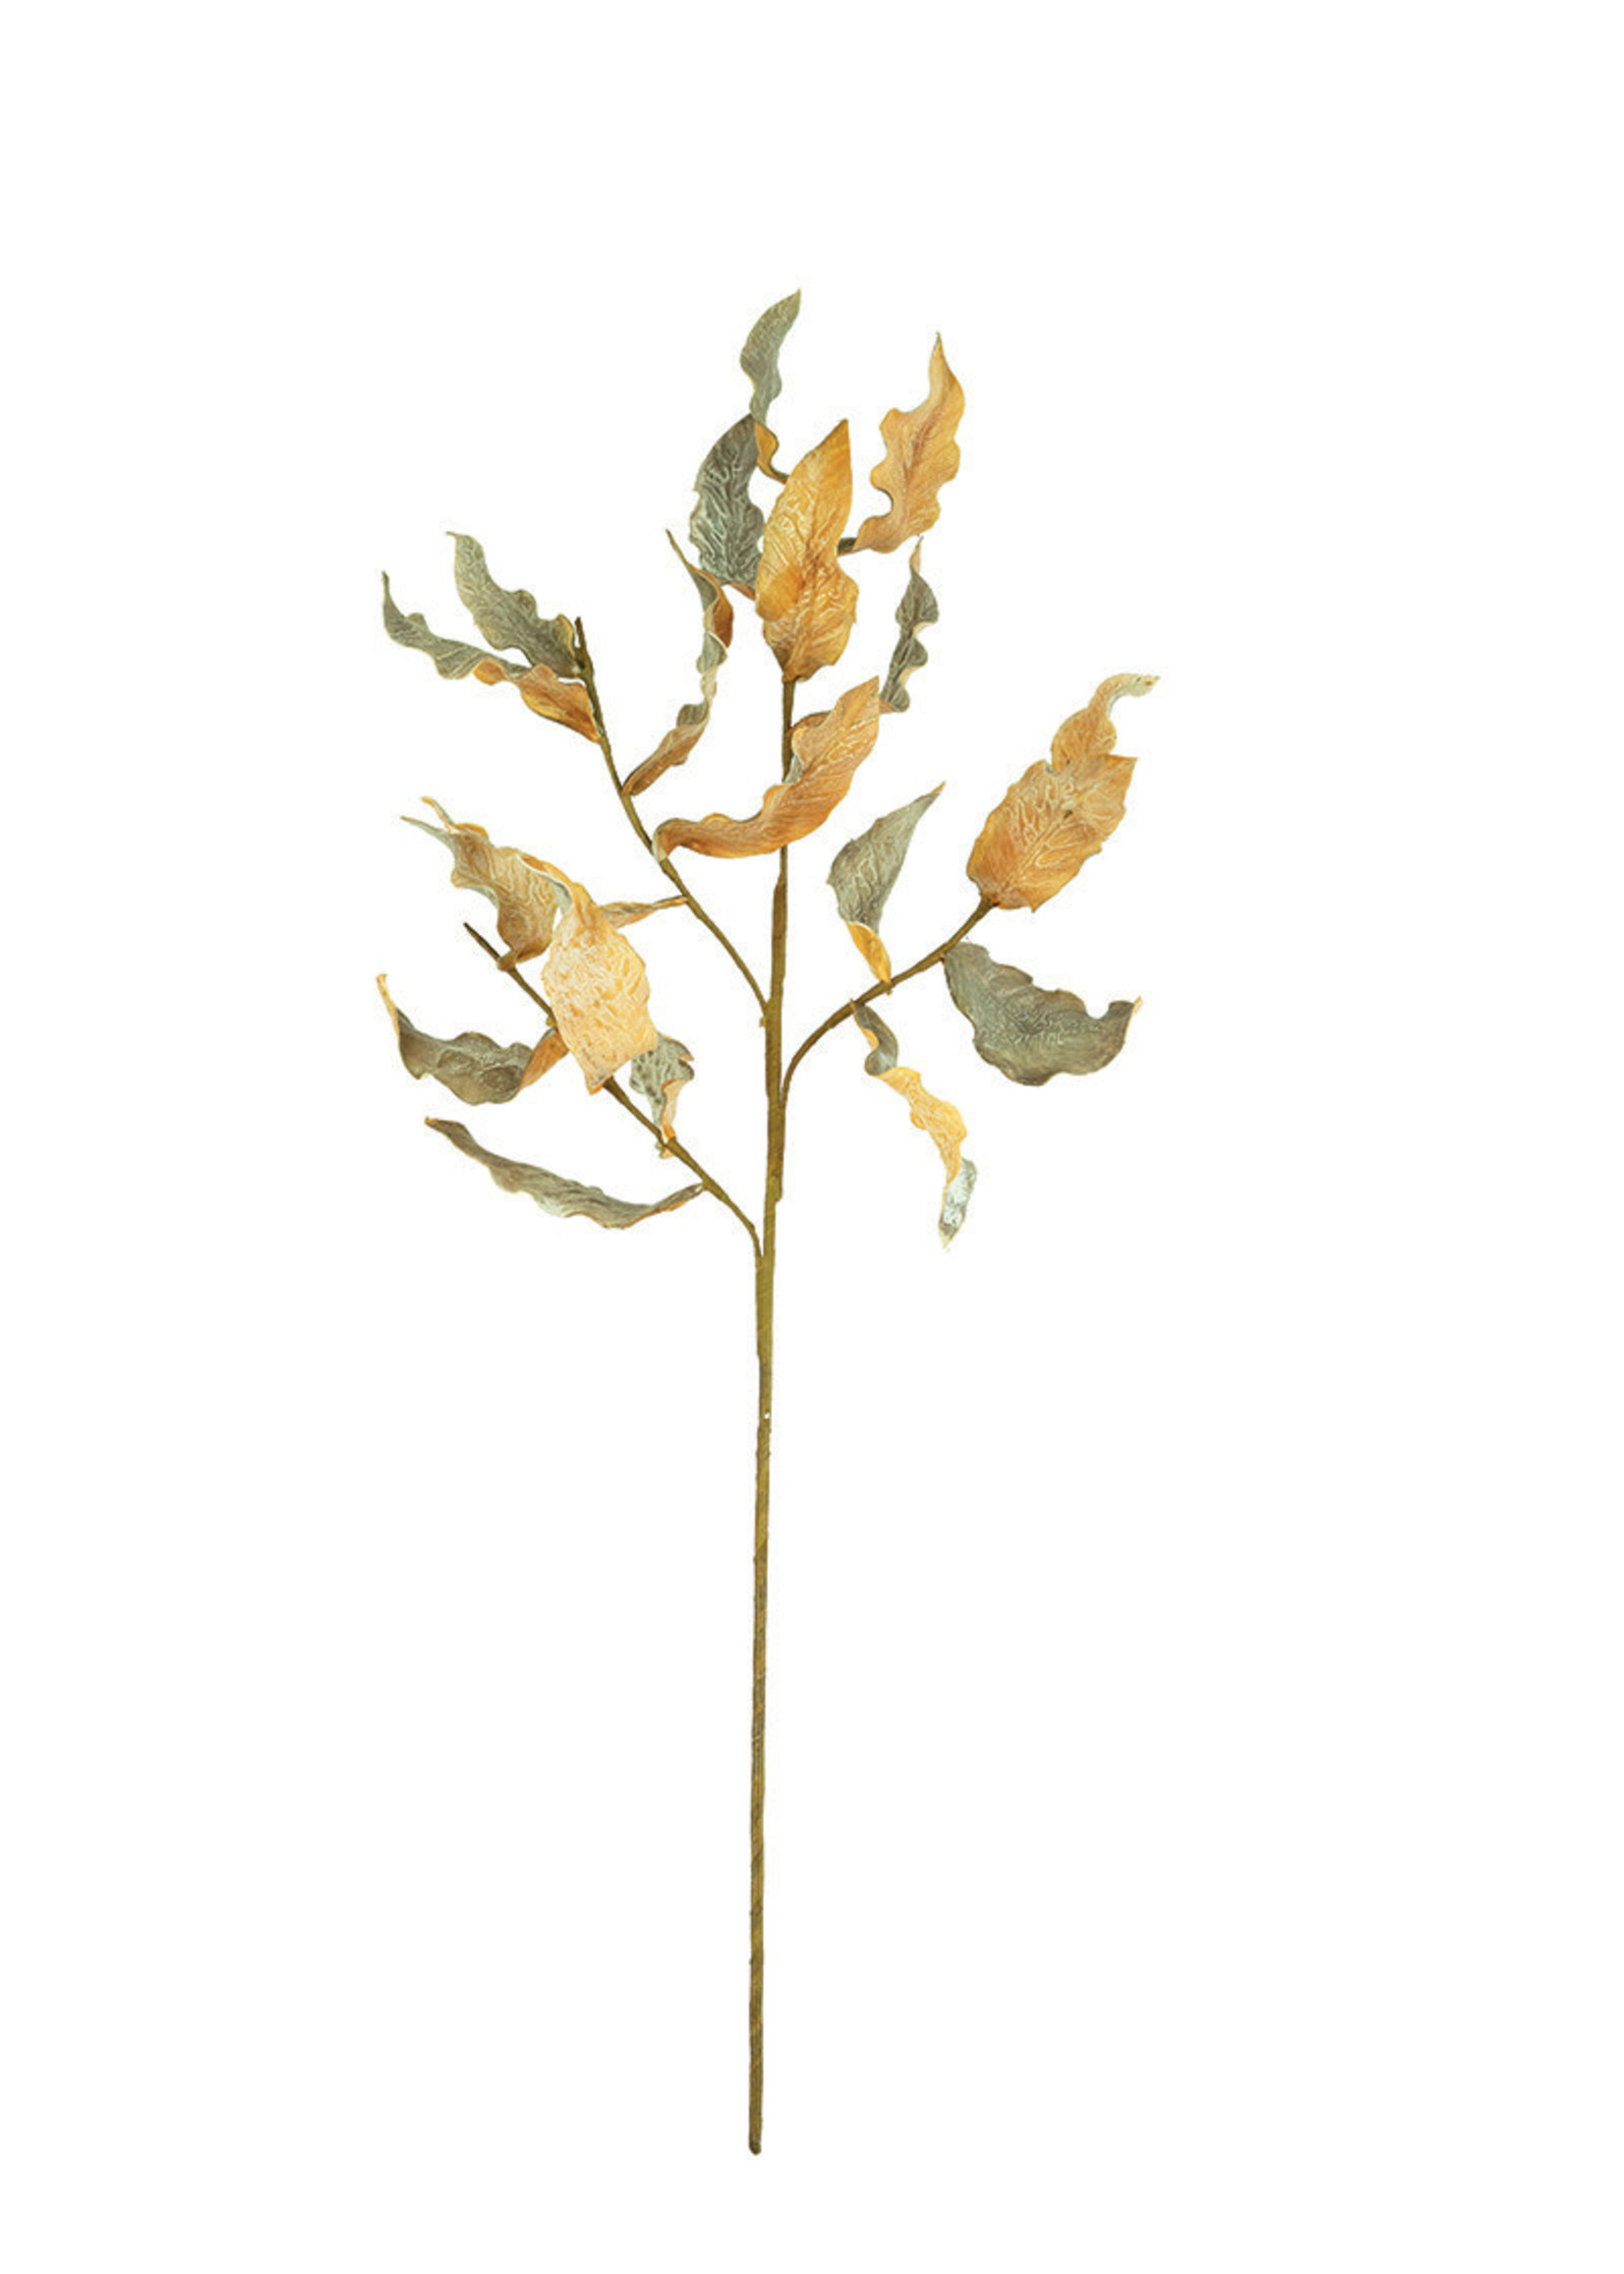 Botanica #3269